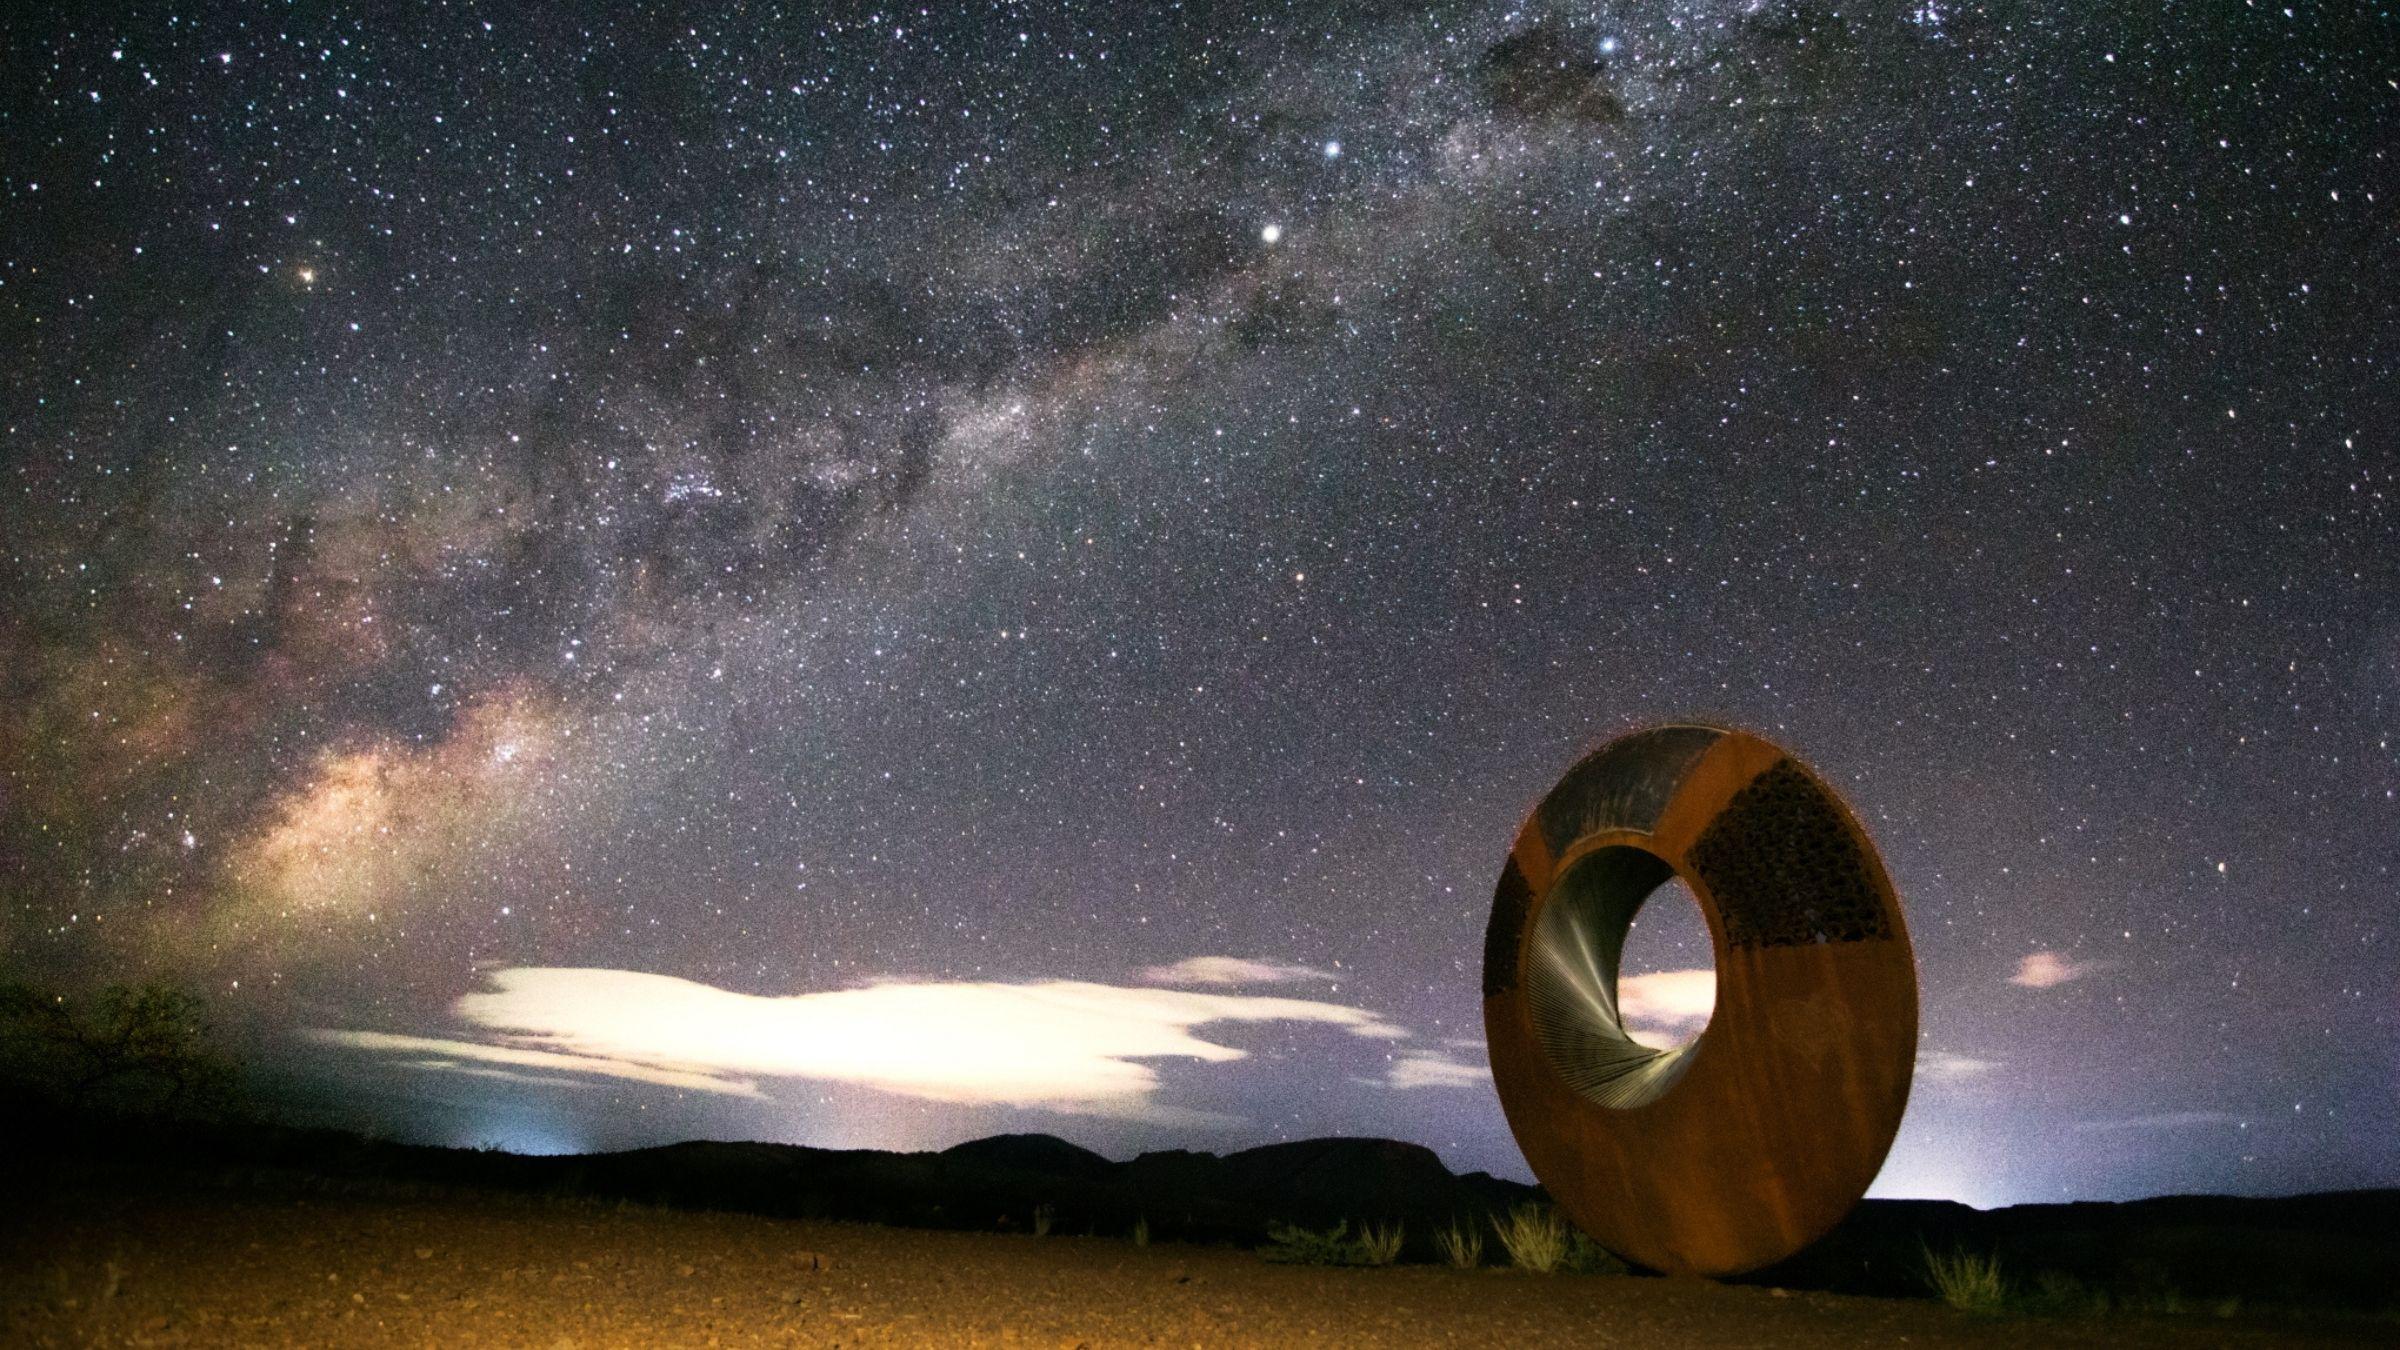 Pilbara and Southern Wheatbelt Aim for the Stars